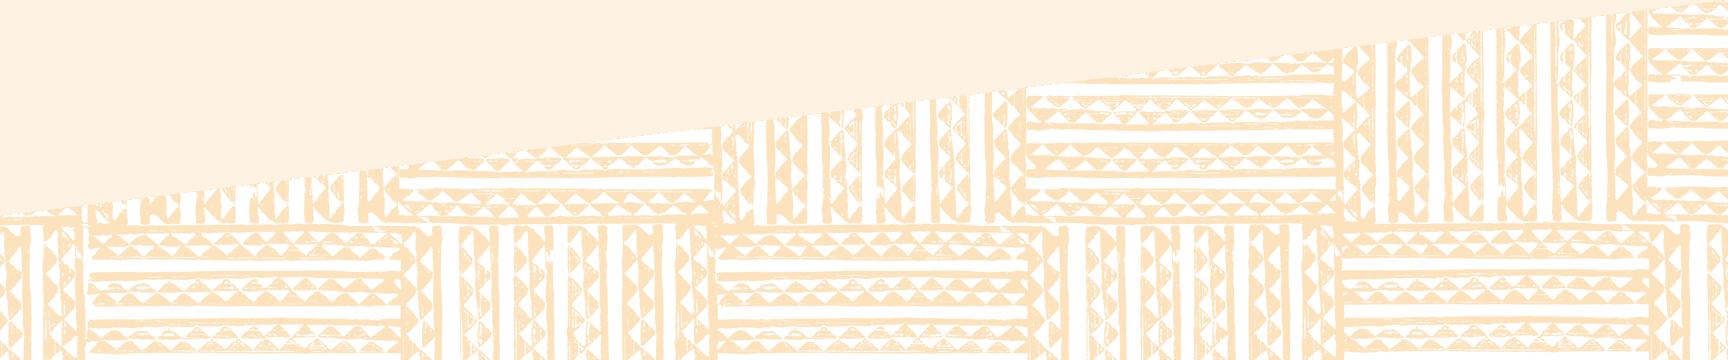 Gold Ulana Pattern on Transparent Background